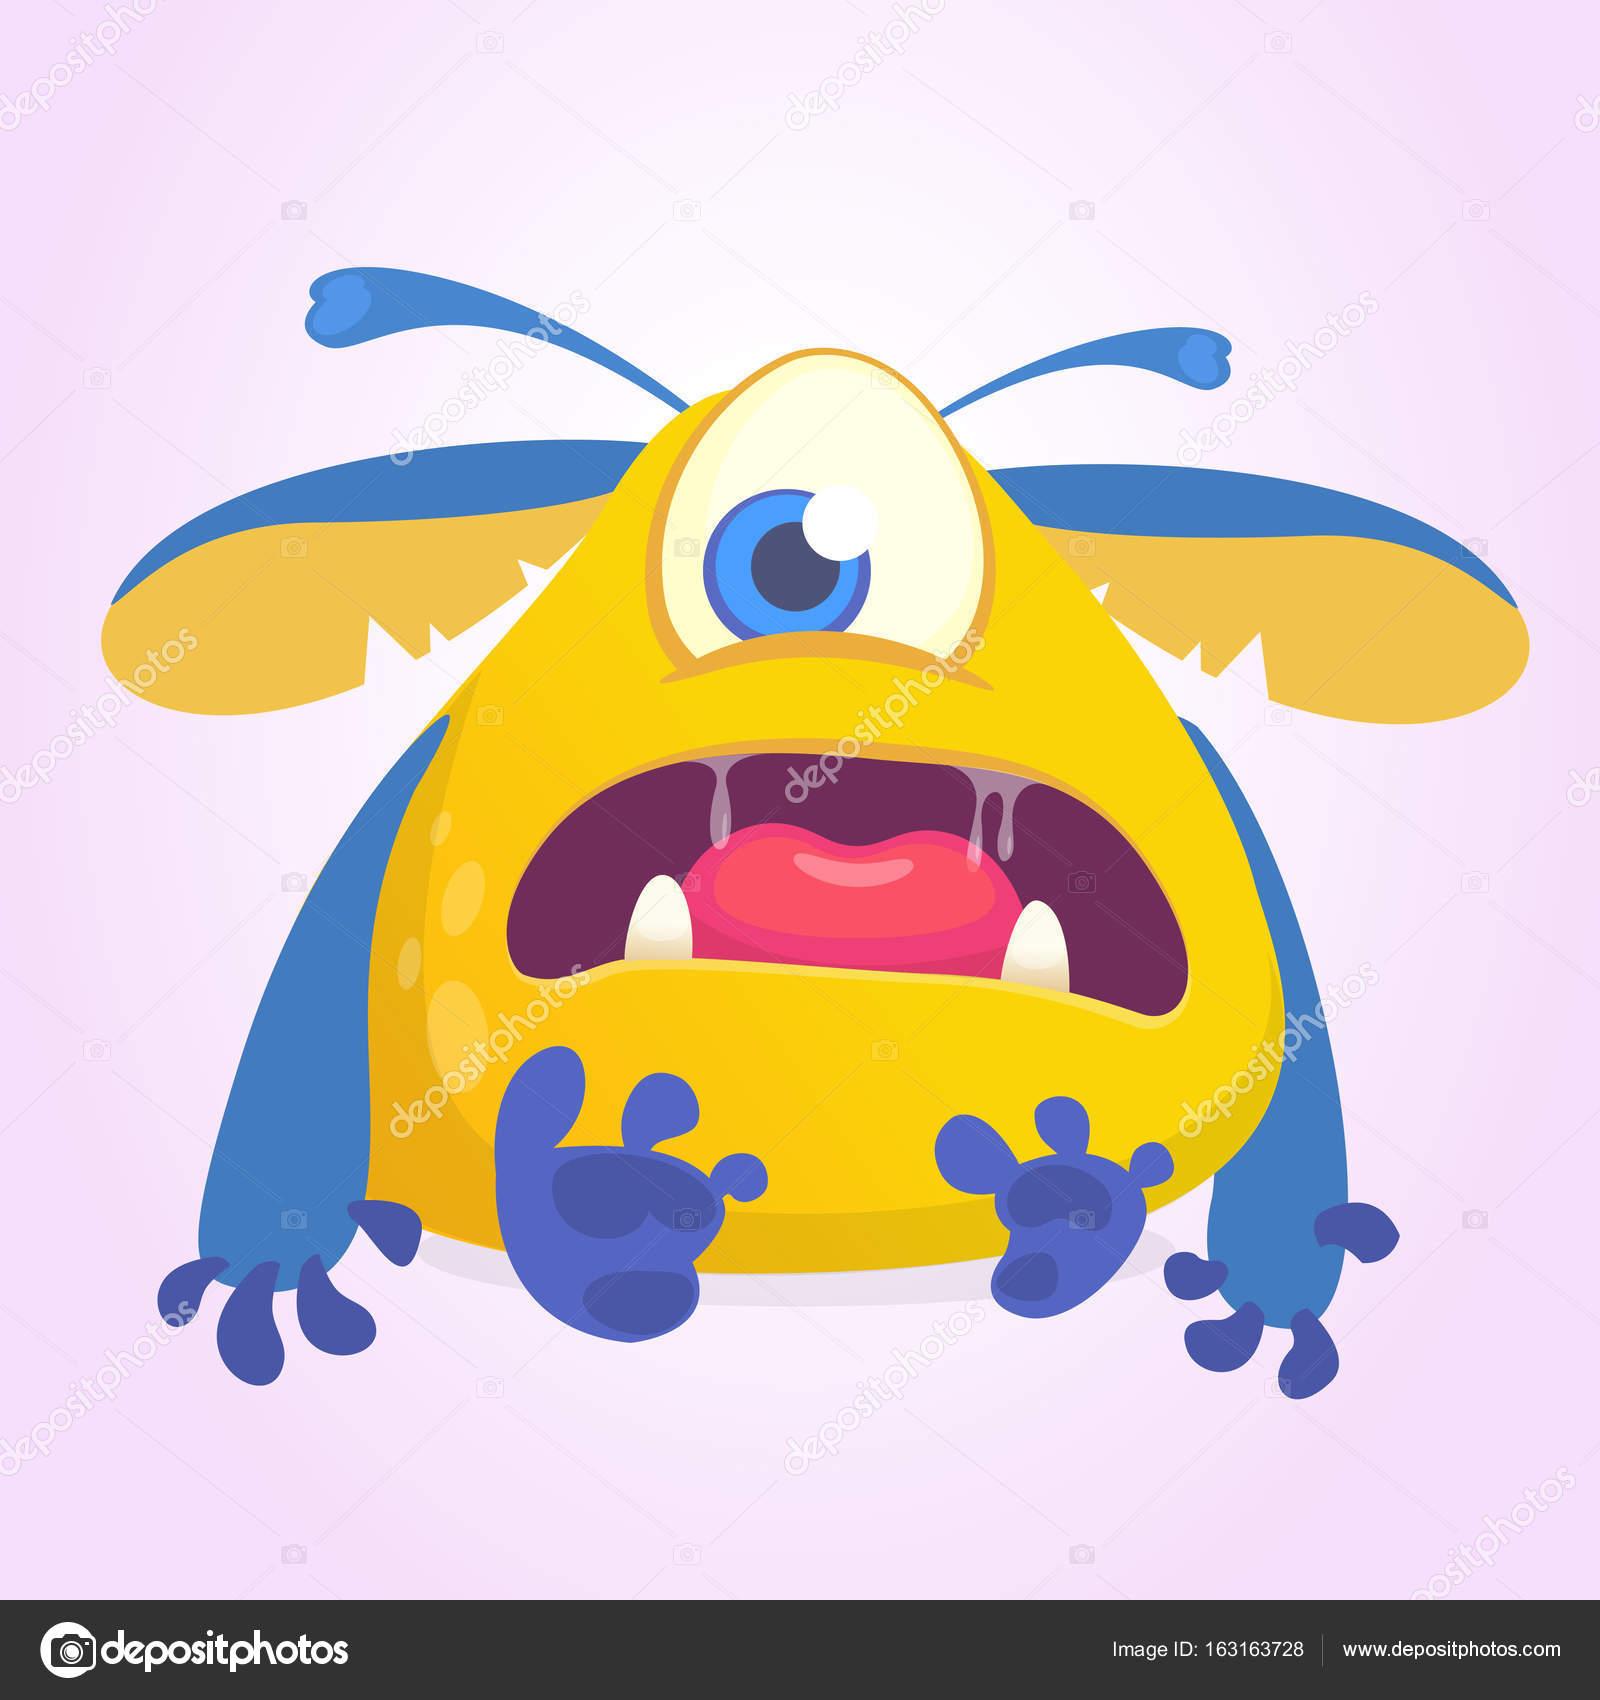 1 Eyed Cartoon Characters : Yellow cartoon character with one eye adultcartoon